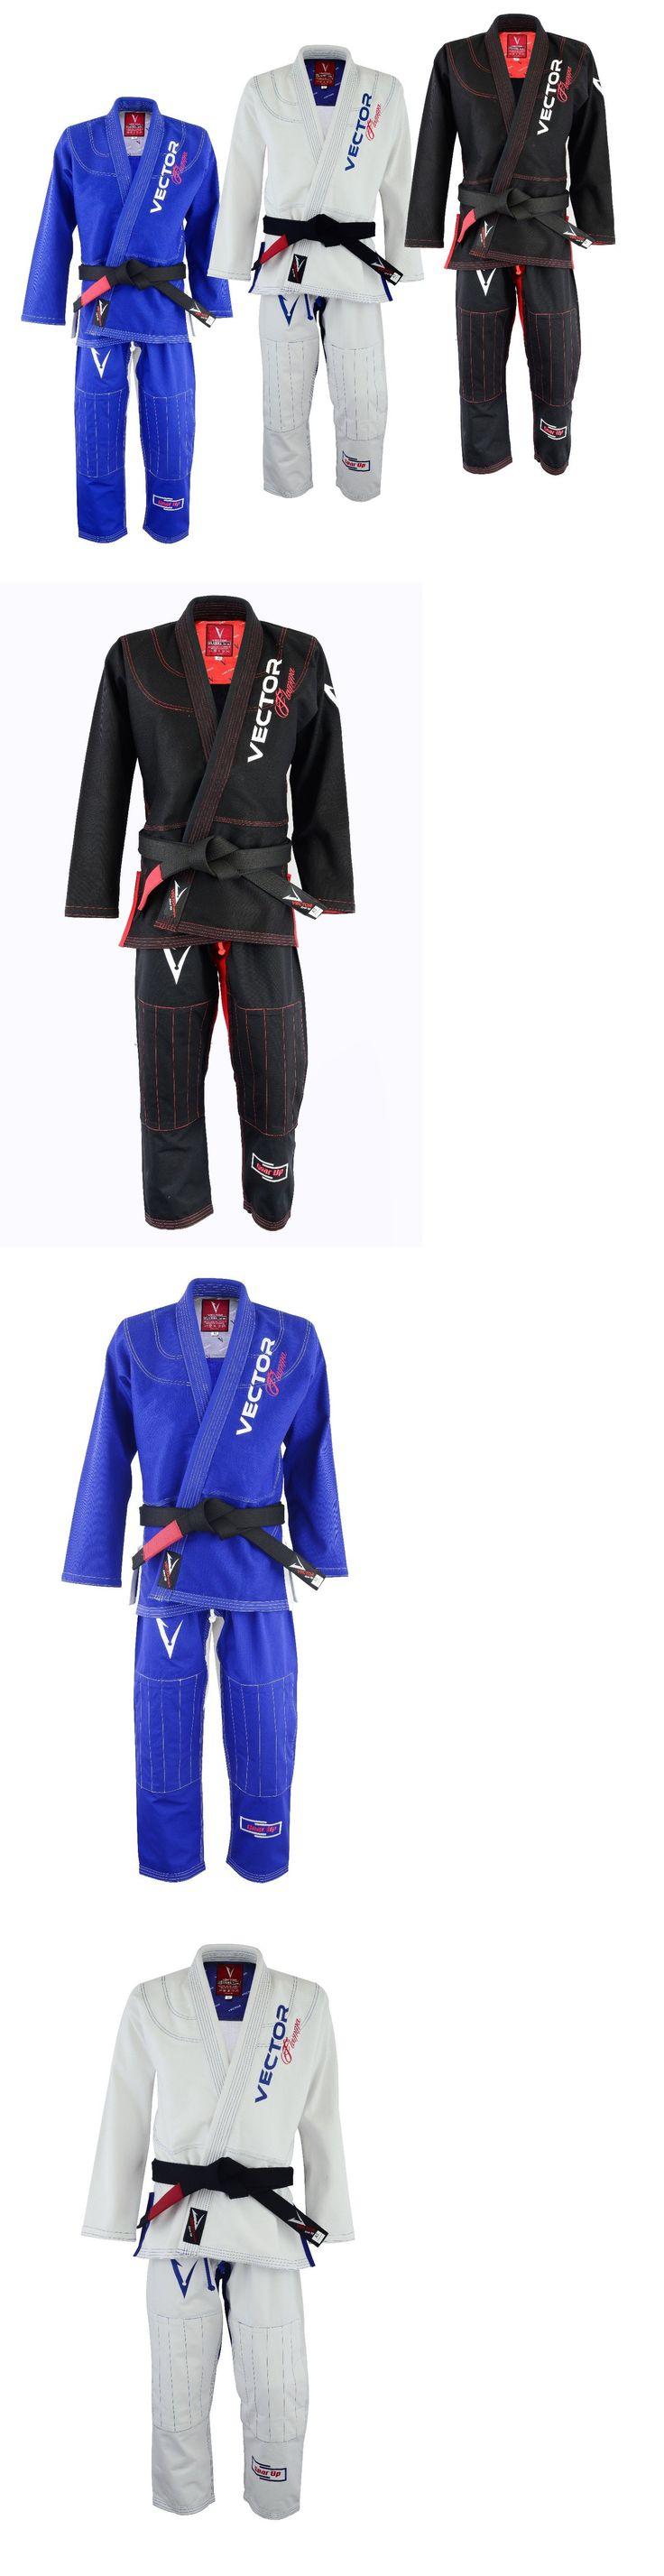 Uniforms and Gis 179774: Vector Brazilian Jiu Jitsu Bjj Gi Kimono Ultra Strong Flamma Series Pre Shrunk -> BUY IT NOW ONLY: $79.99 on eBay!